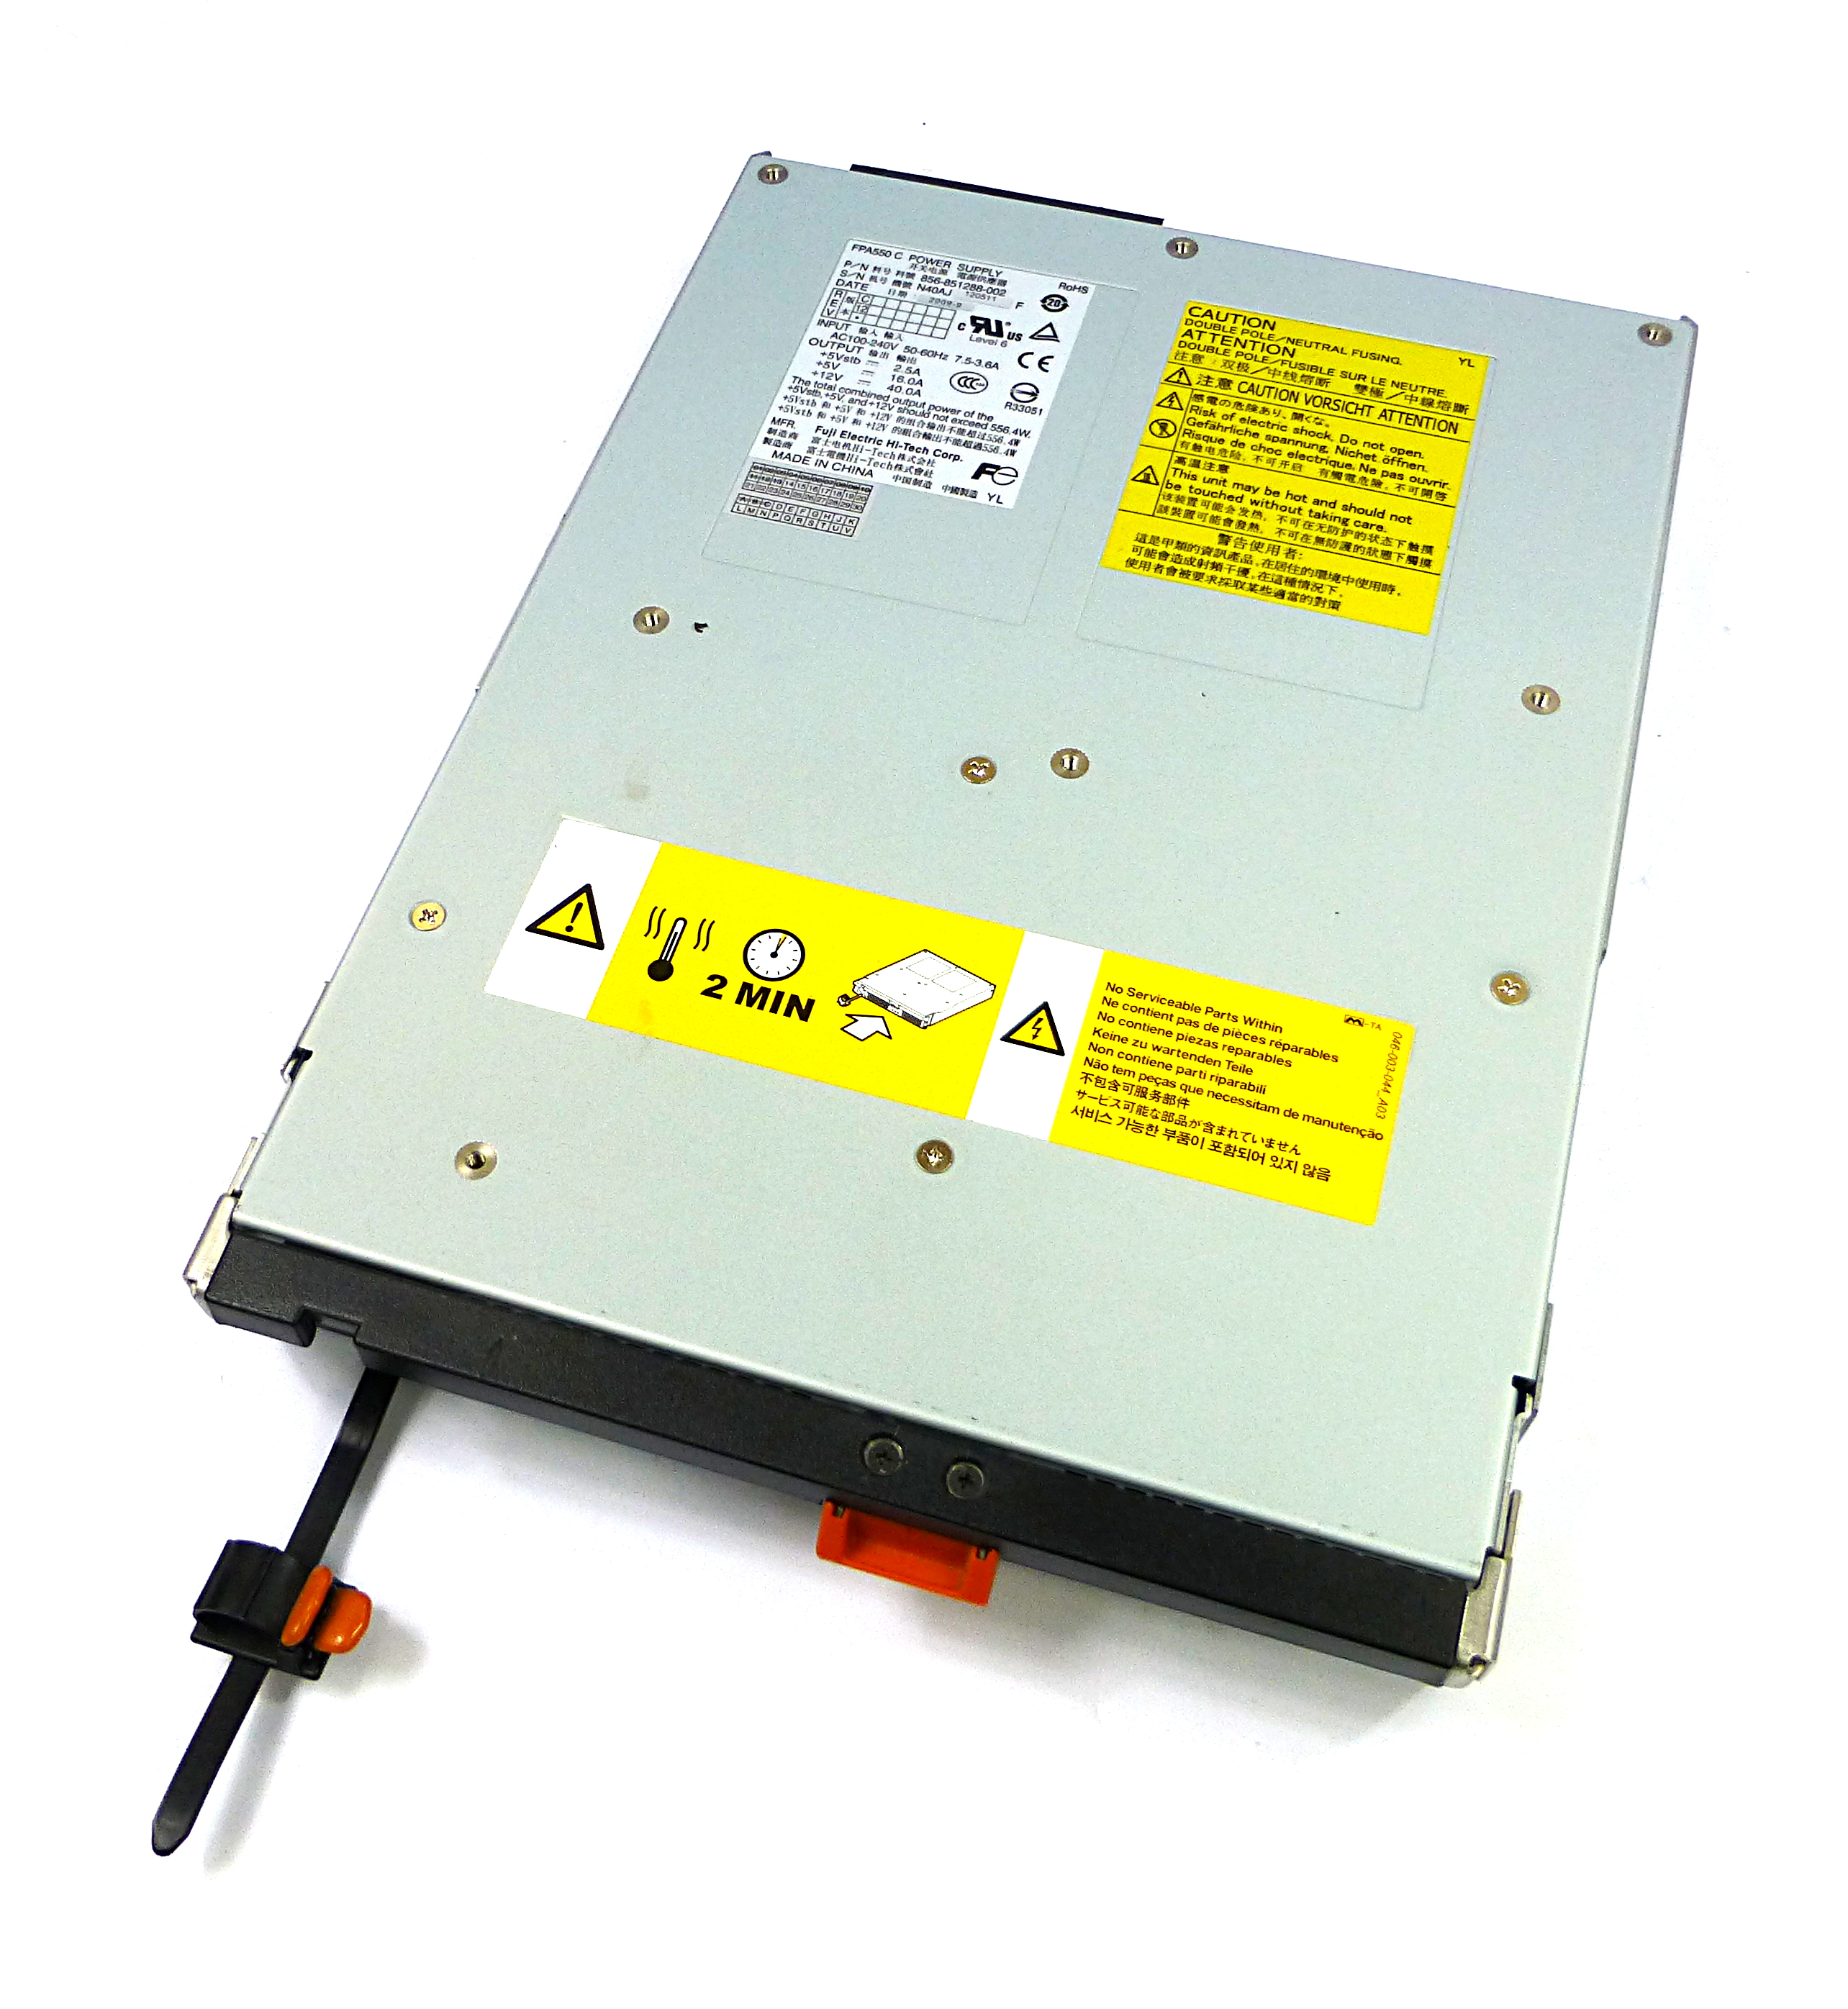 Fuji 856-851288-002 FPA550C 550W Power Supply